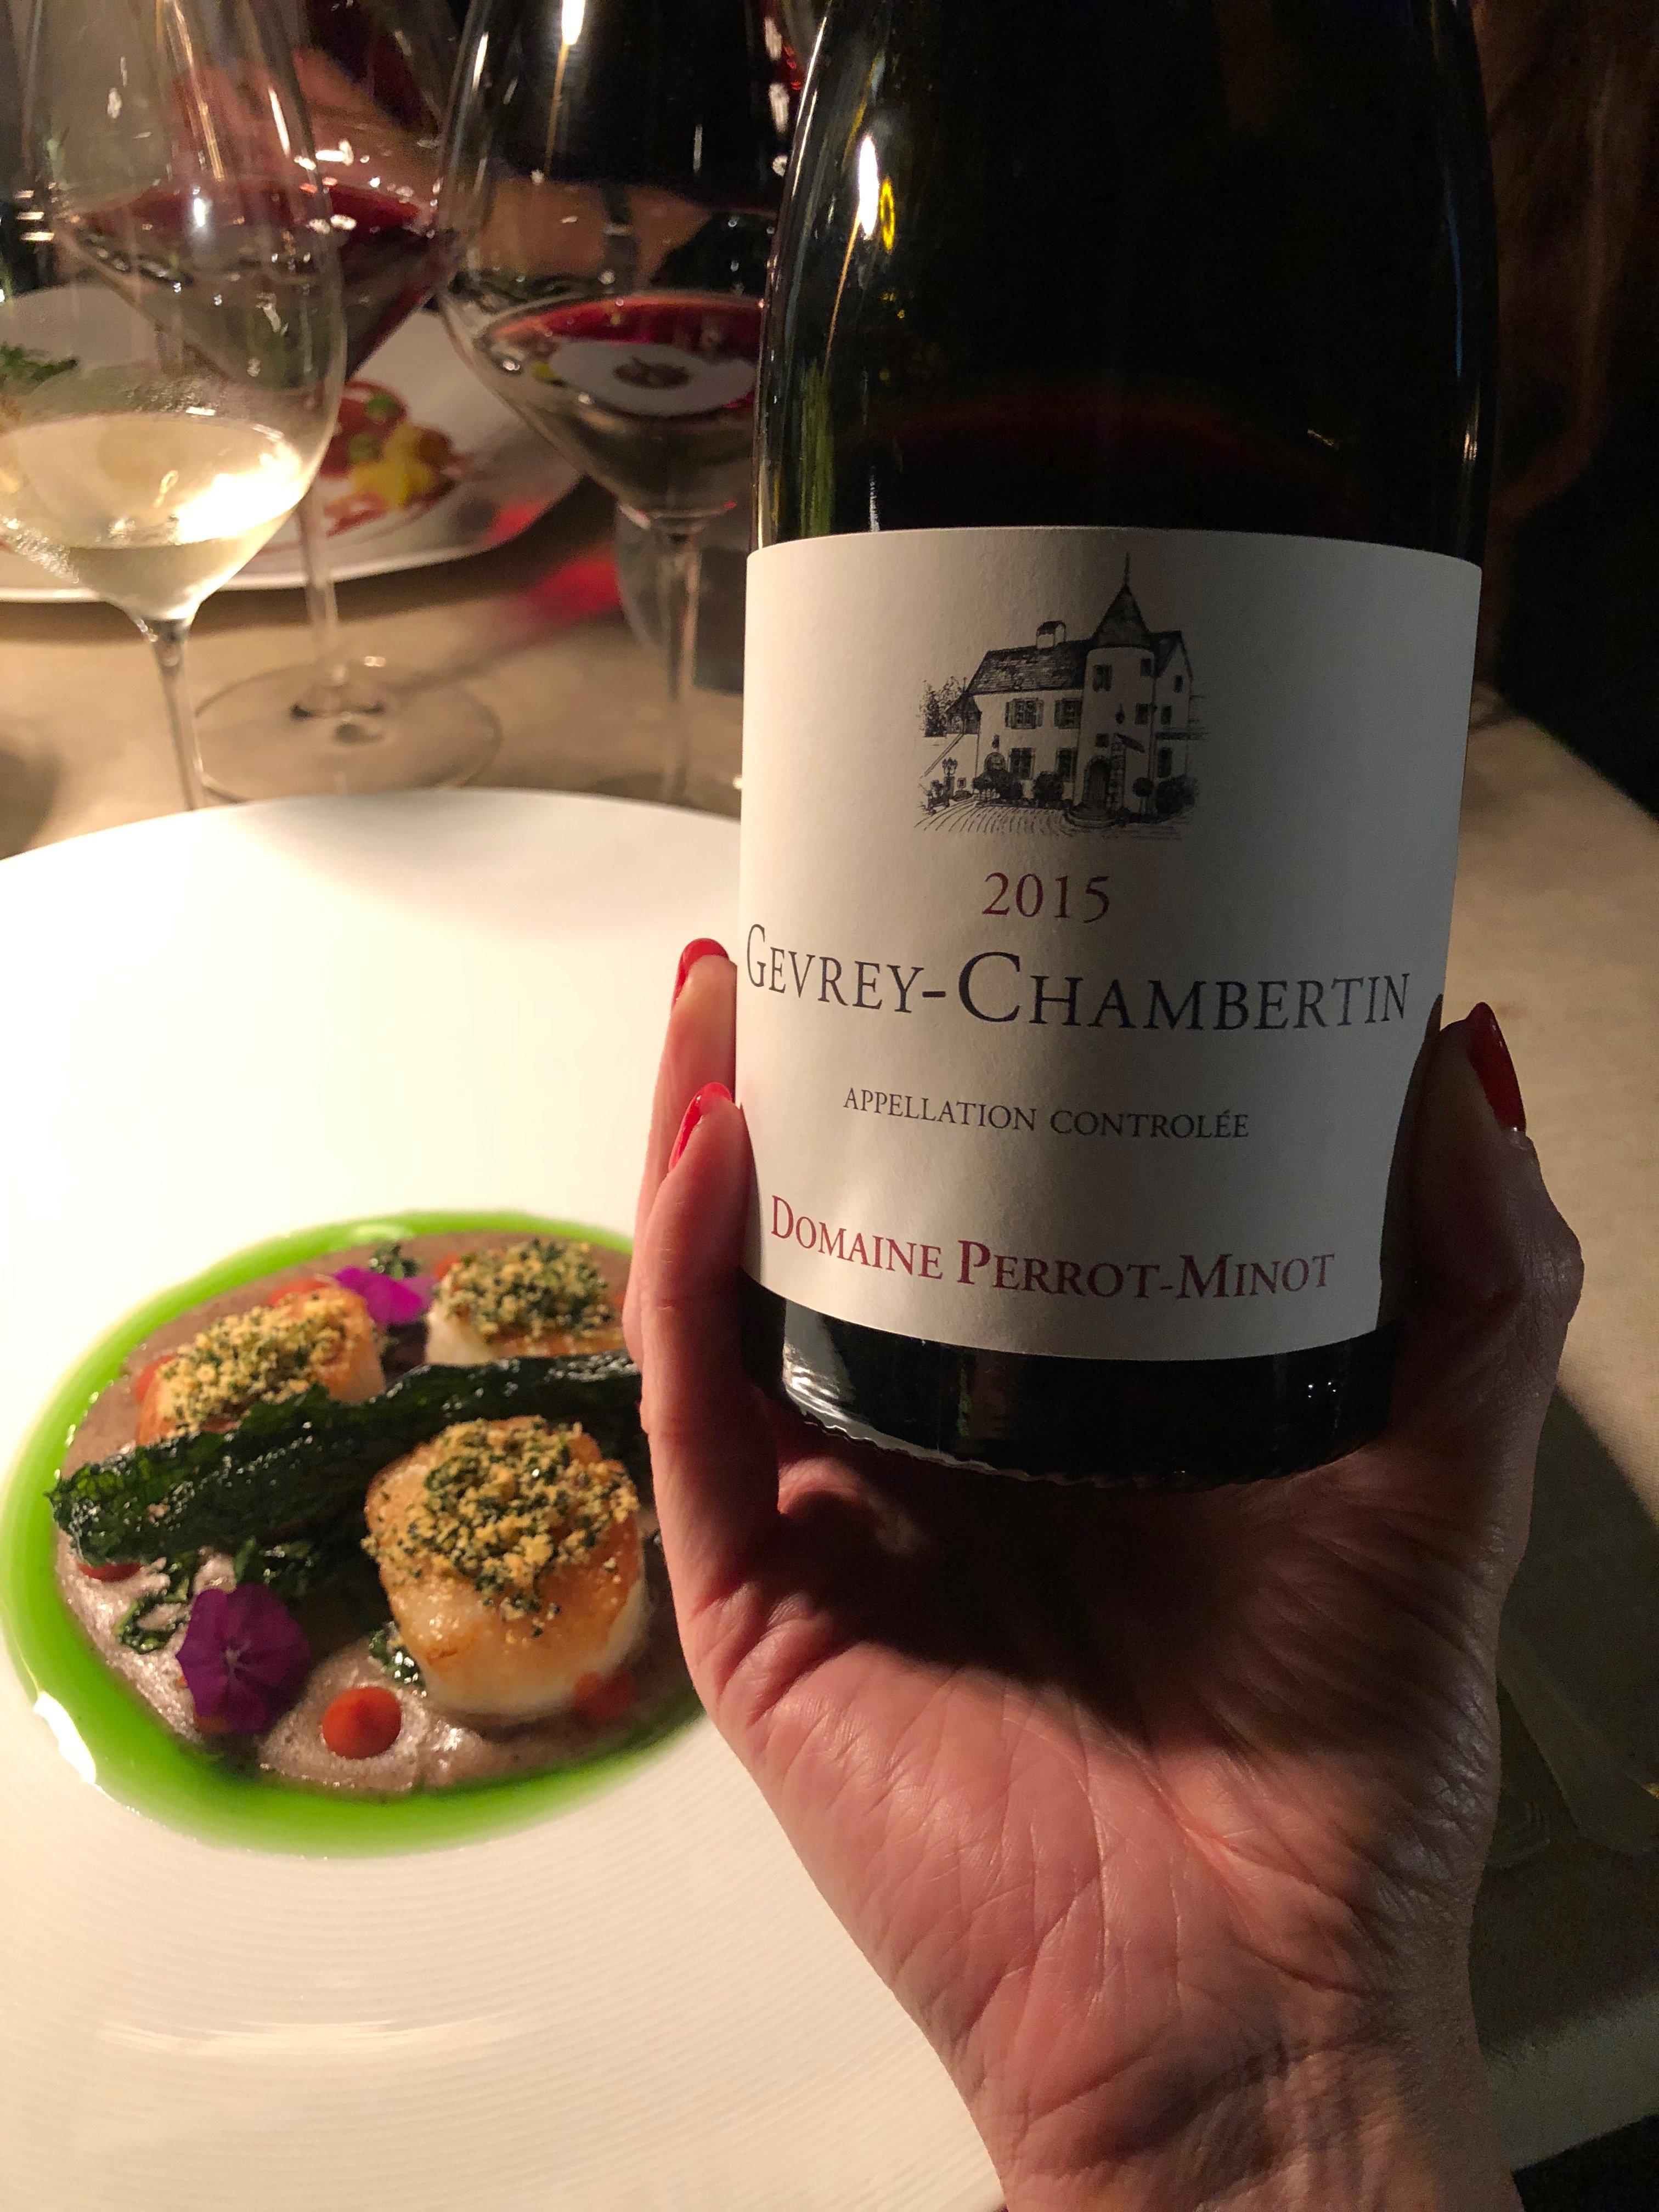 Gevrey-Chambertin 2015 del Domaine Perrot-Minot